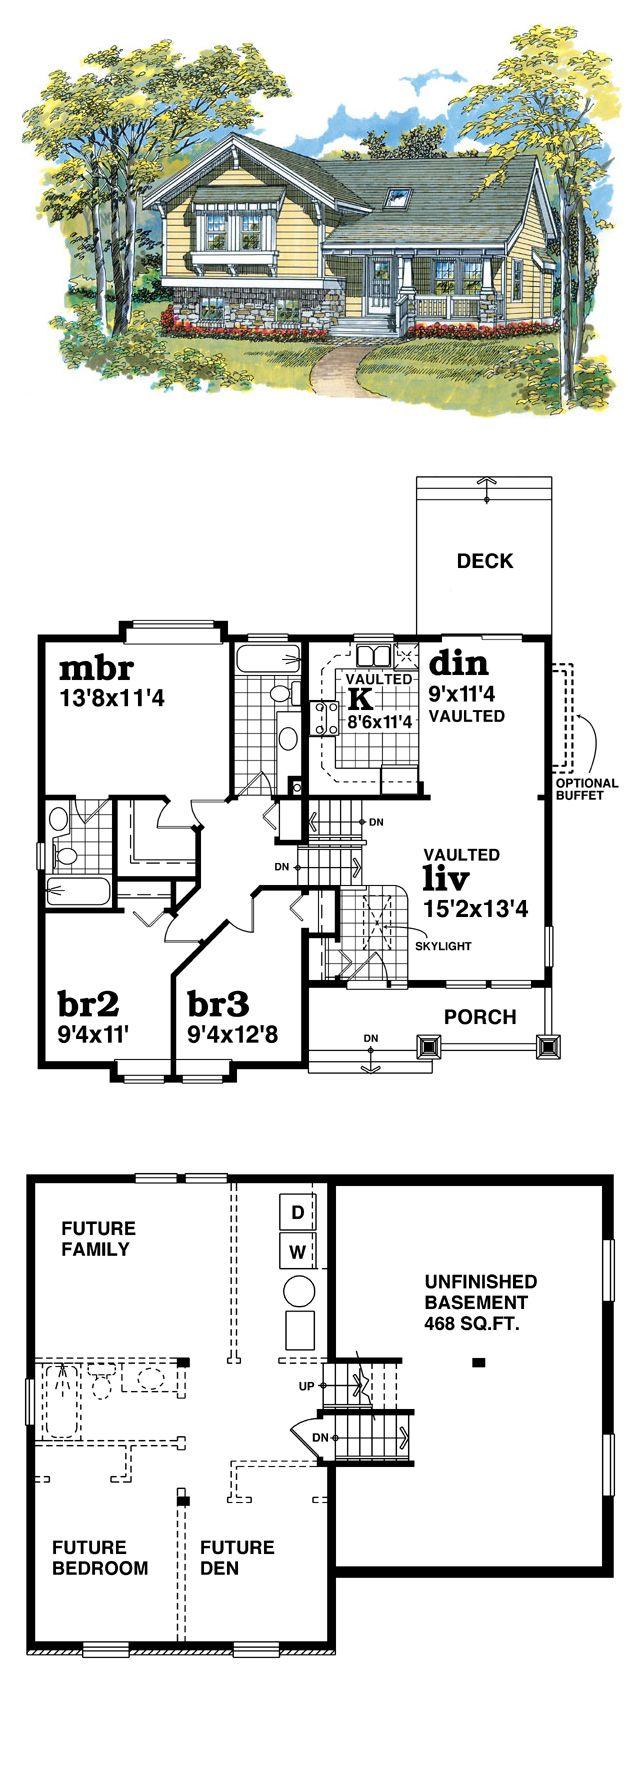 16 best split level house plans images on pinterest cool house cool house plan id chp 20977 total living area 1108 sq jameslax Choice Image